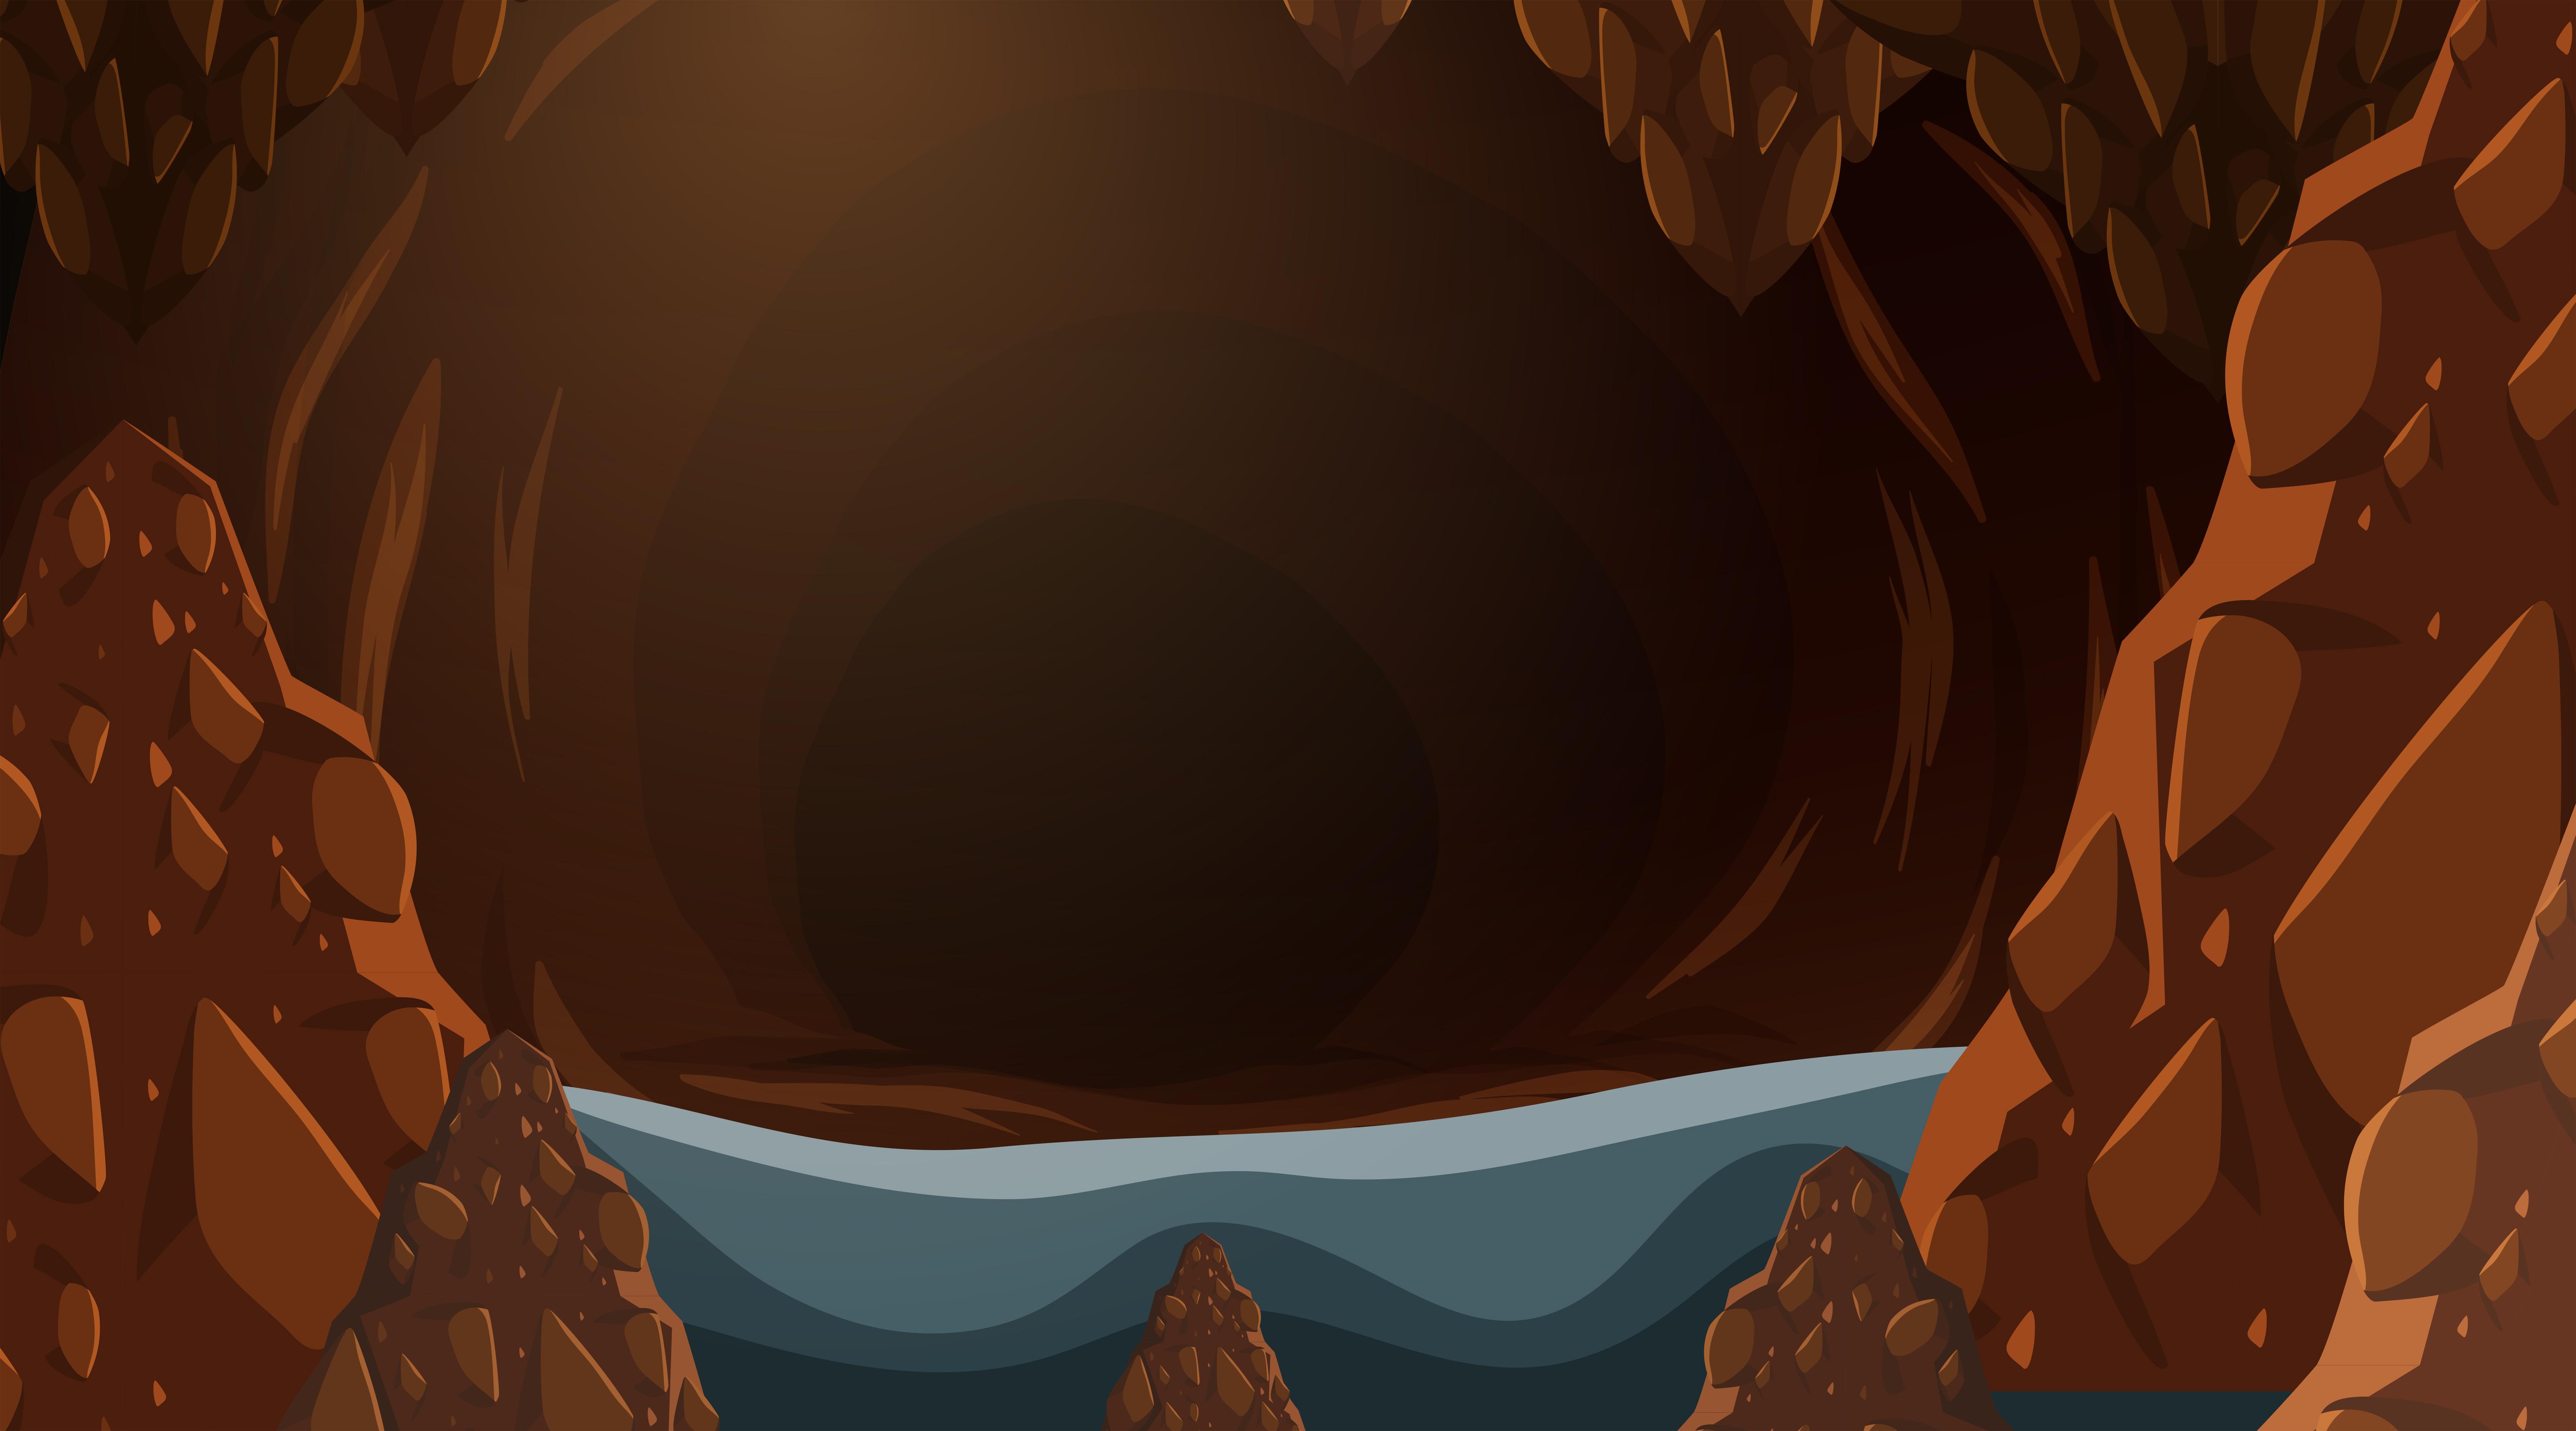 Dark Cave Background Download Free Vectors Clipart Graphics Vector Art